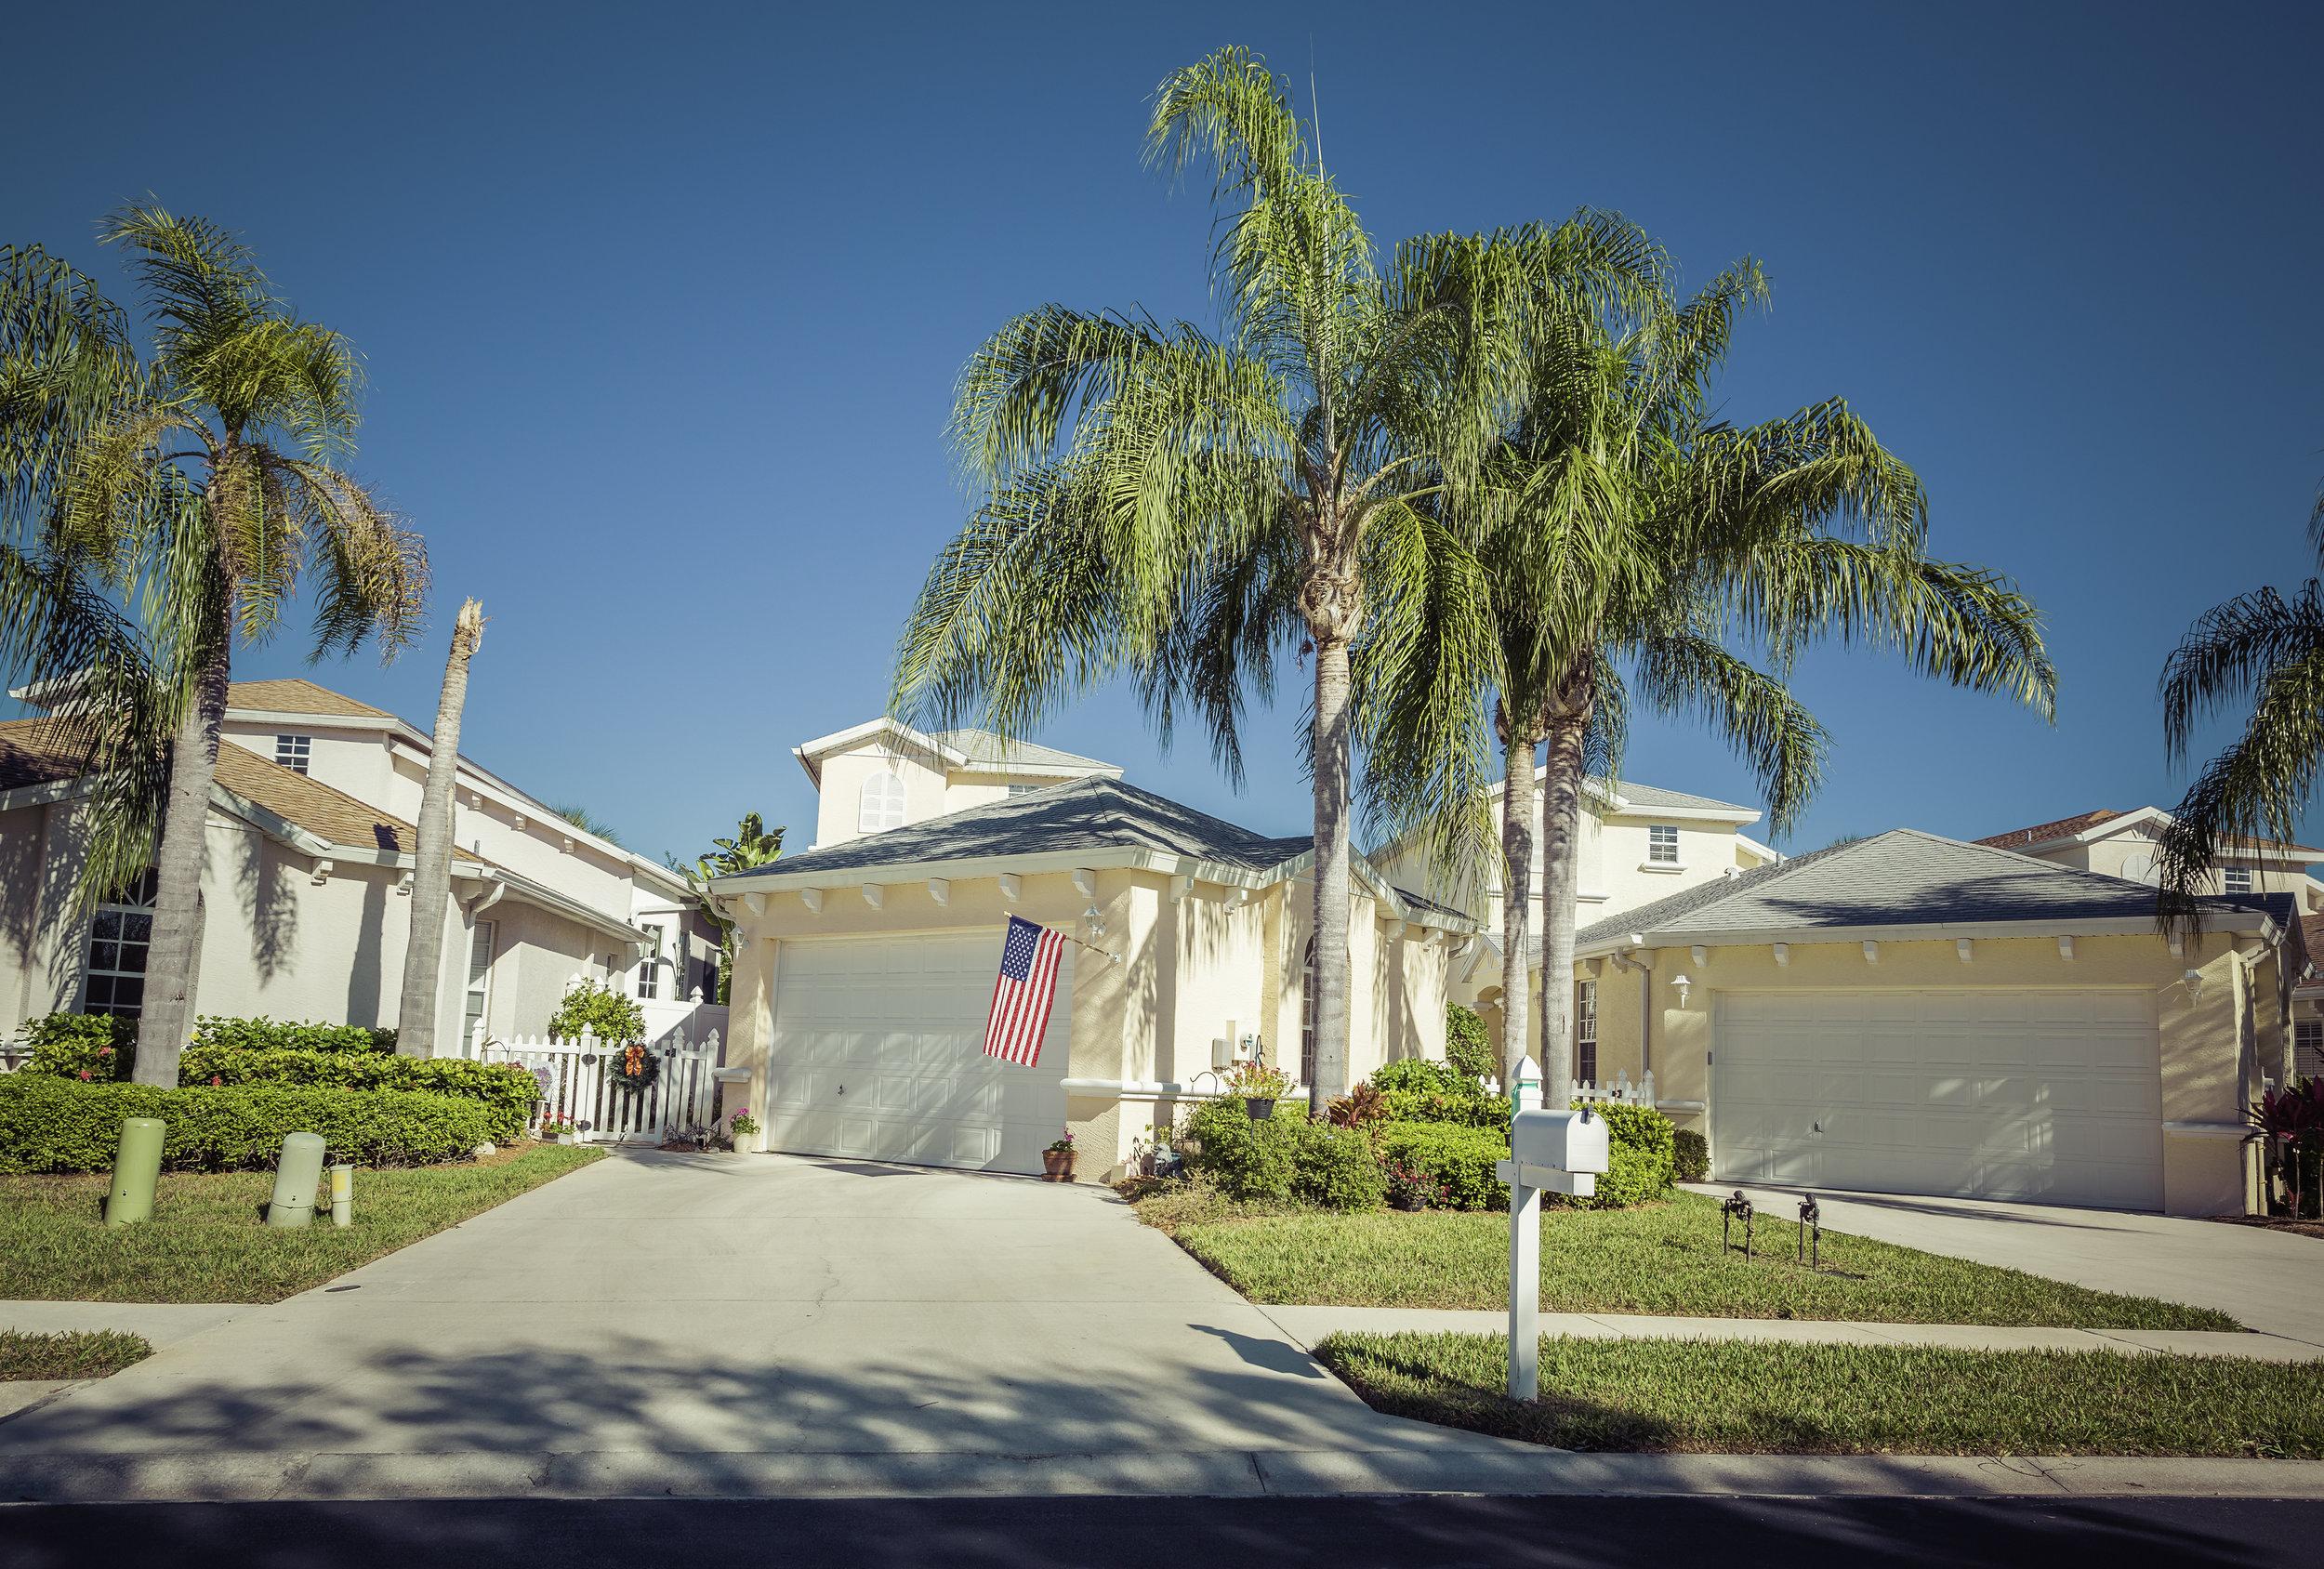 Joe-the-Home-Pro-Estero-Florida-Home-photo